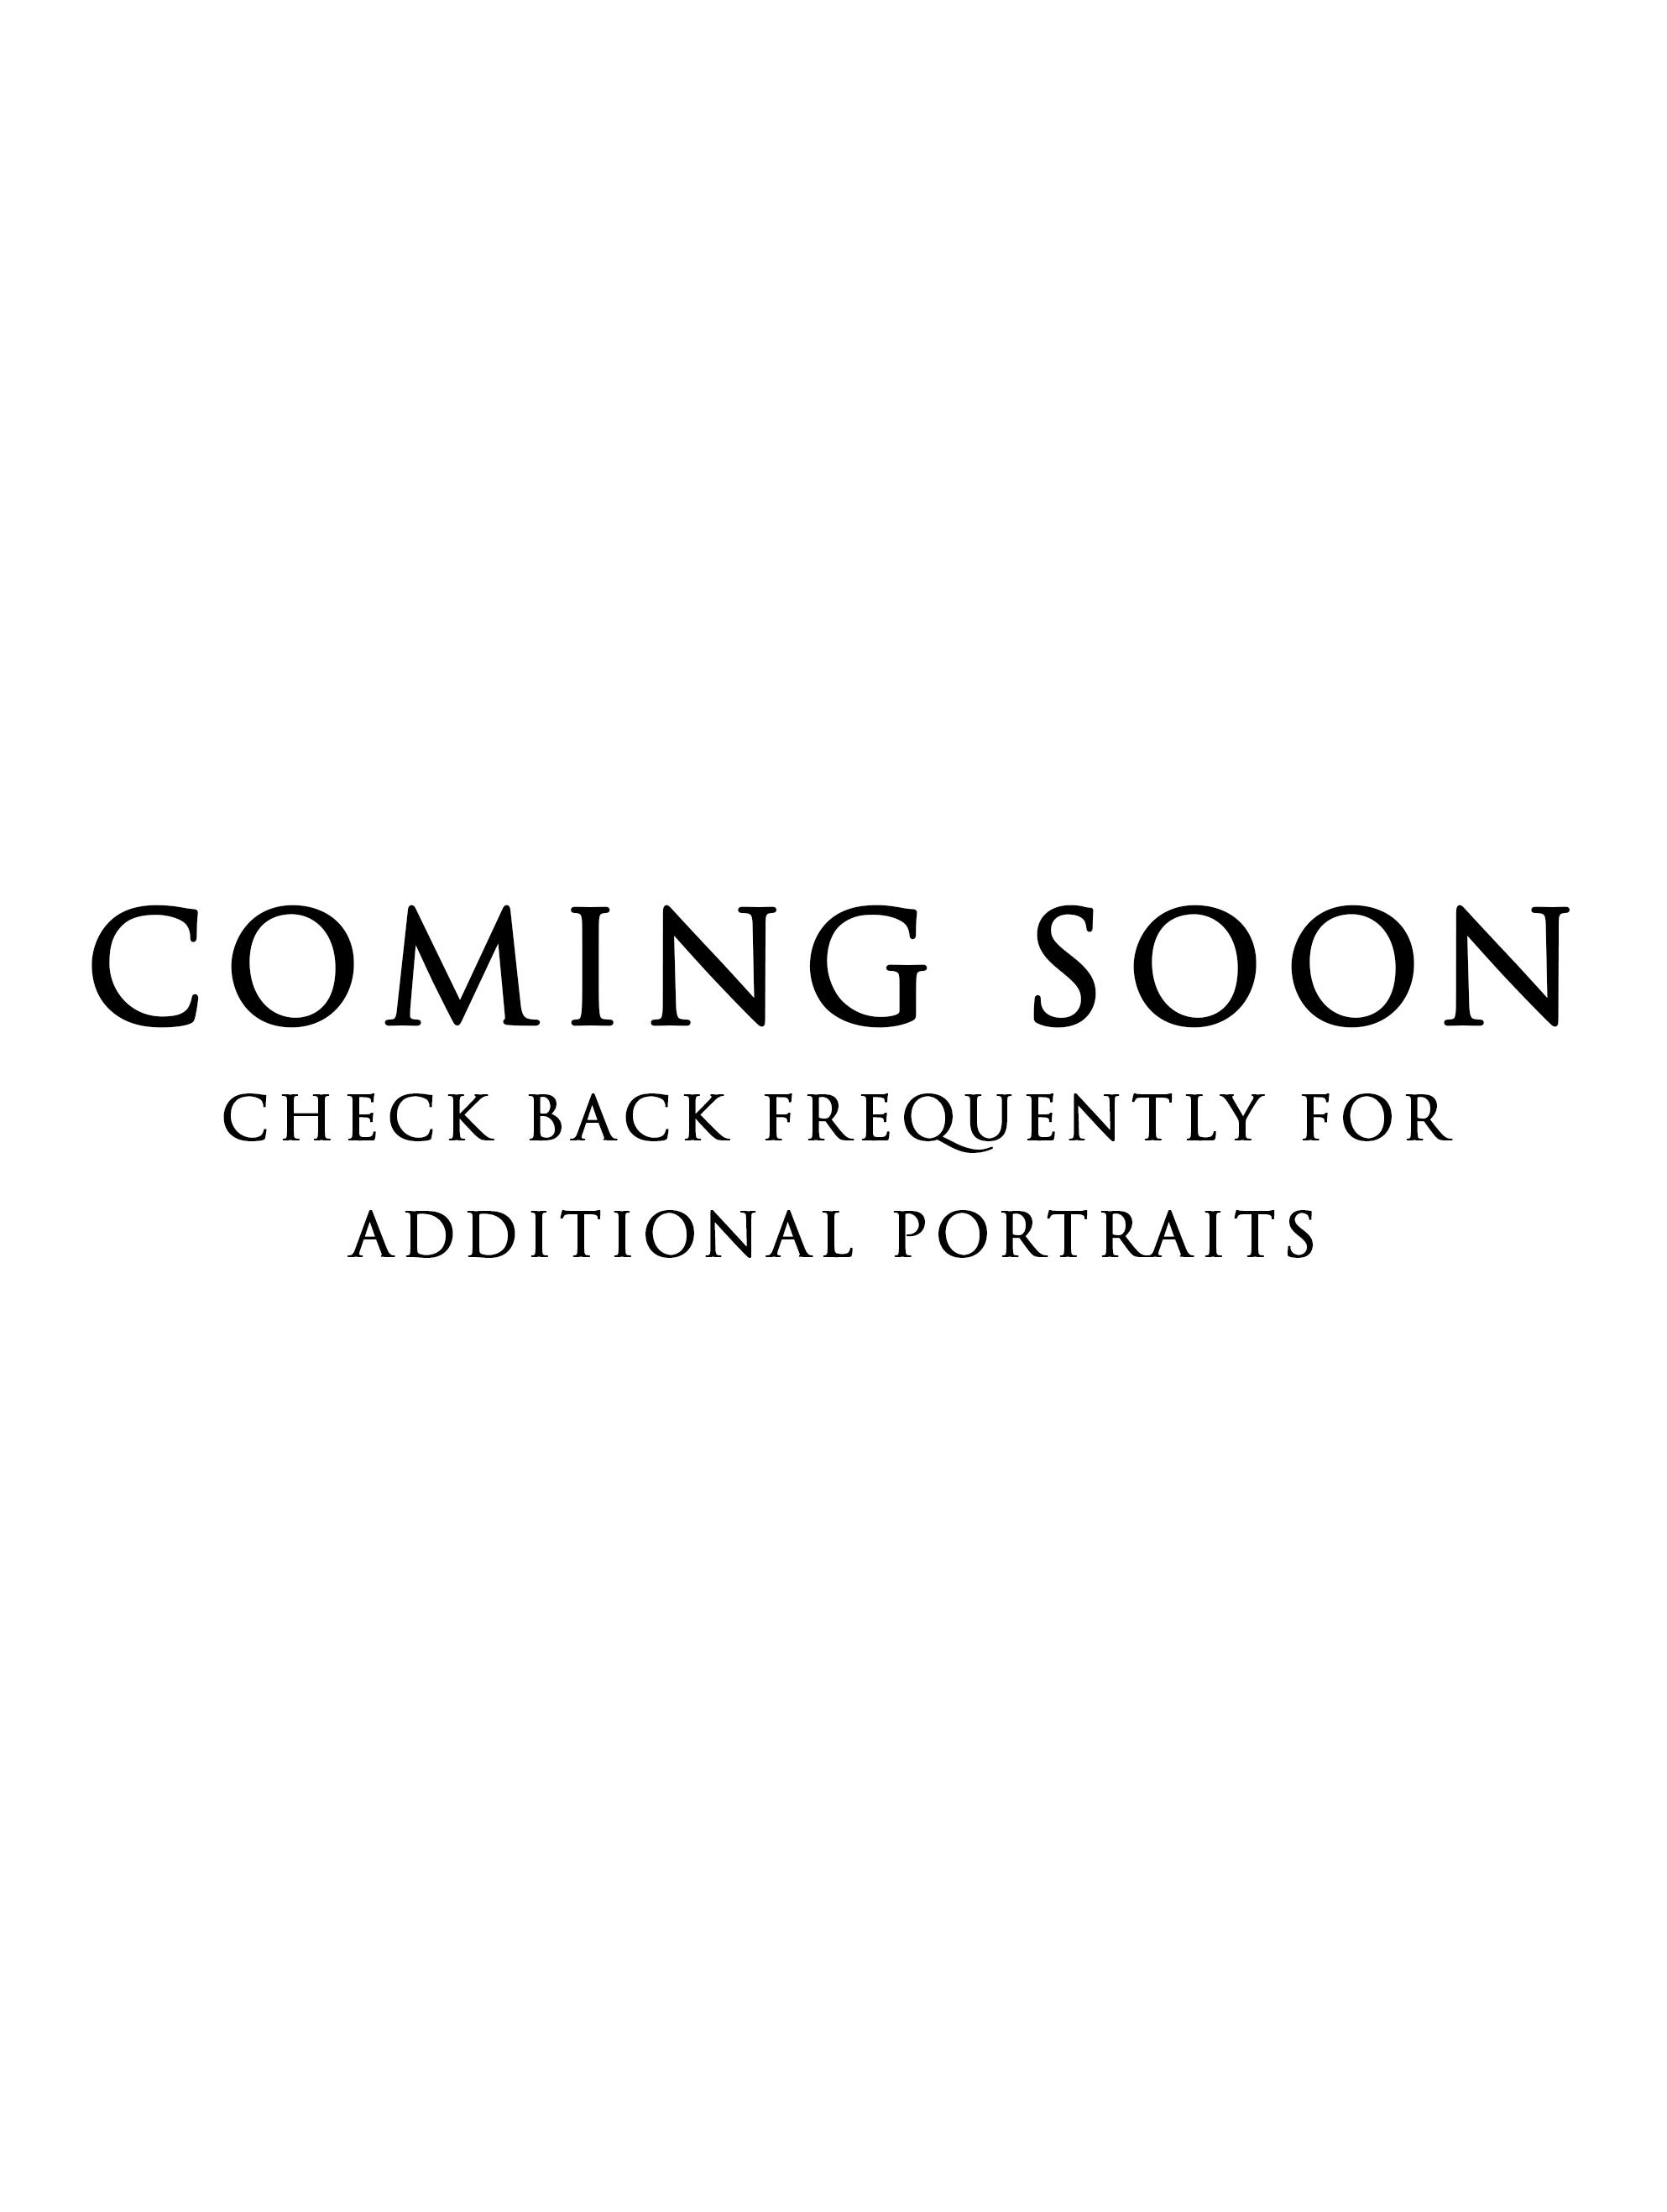 Portraits Coming Soon